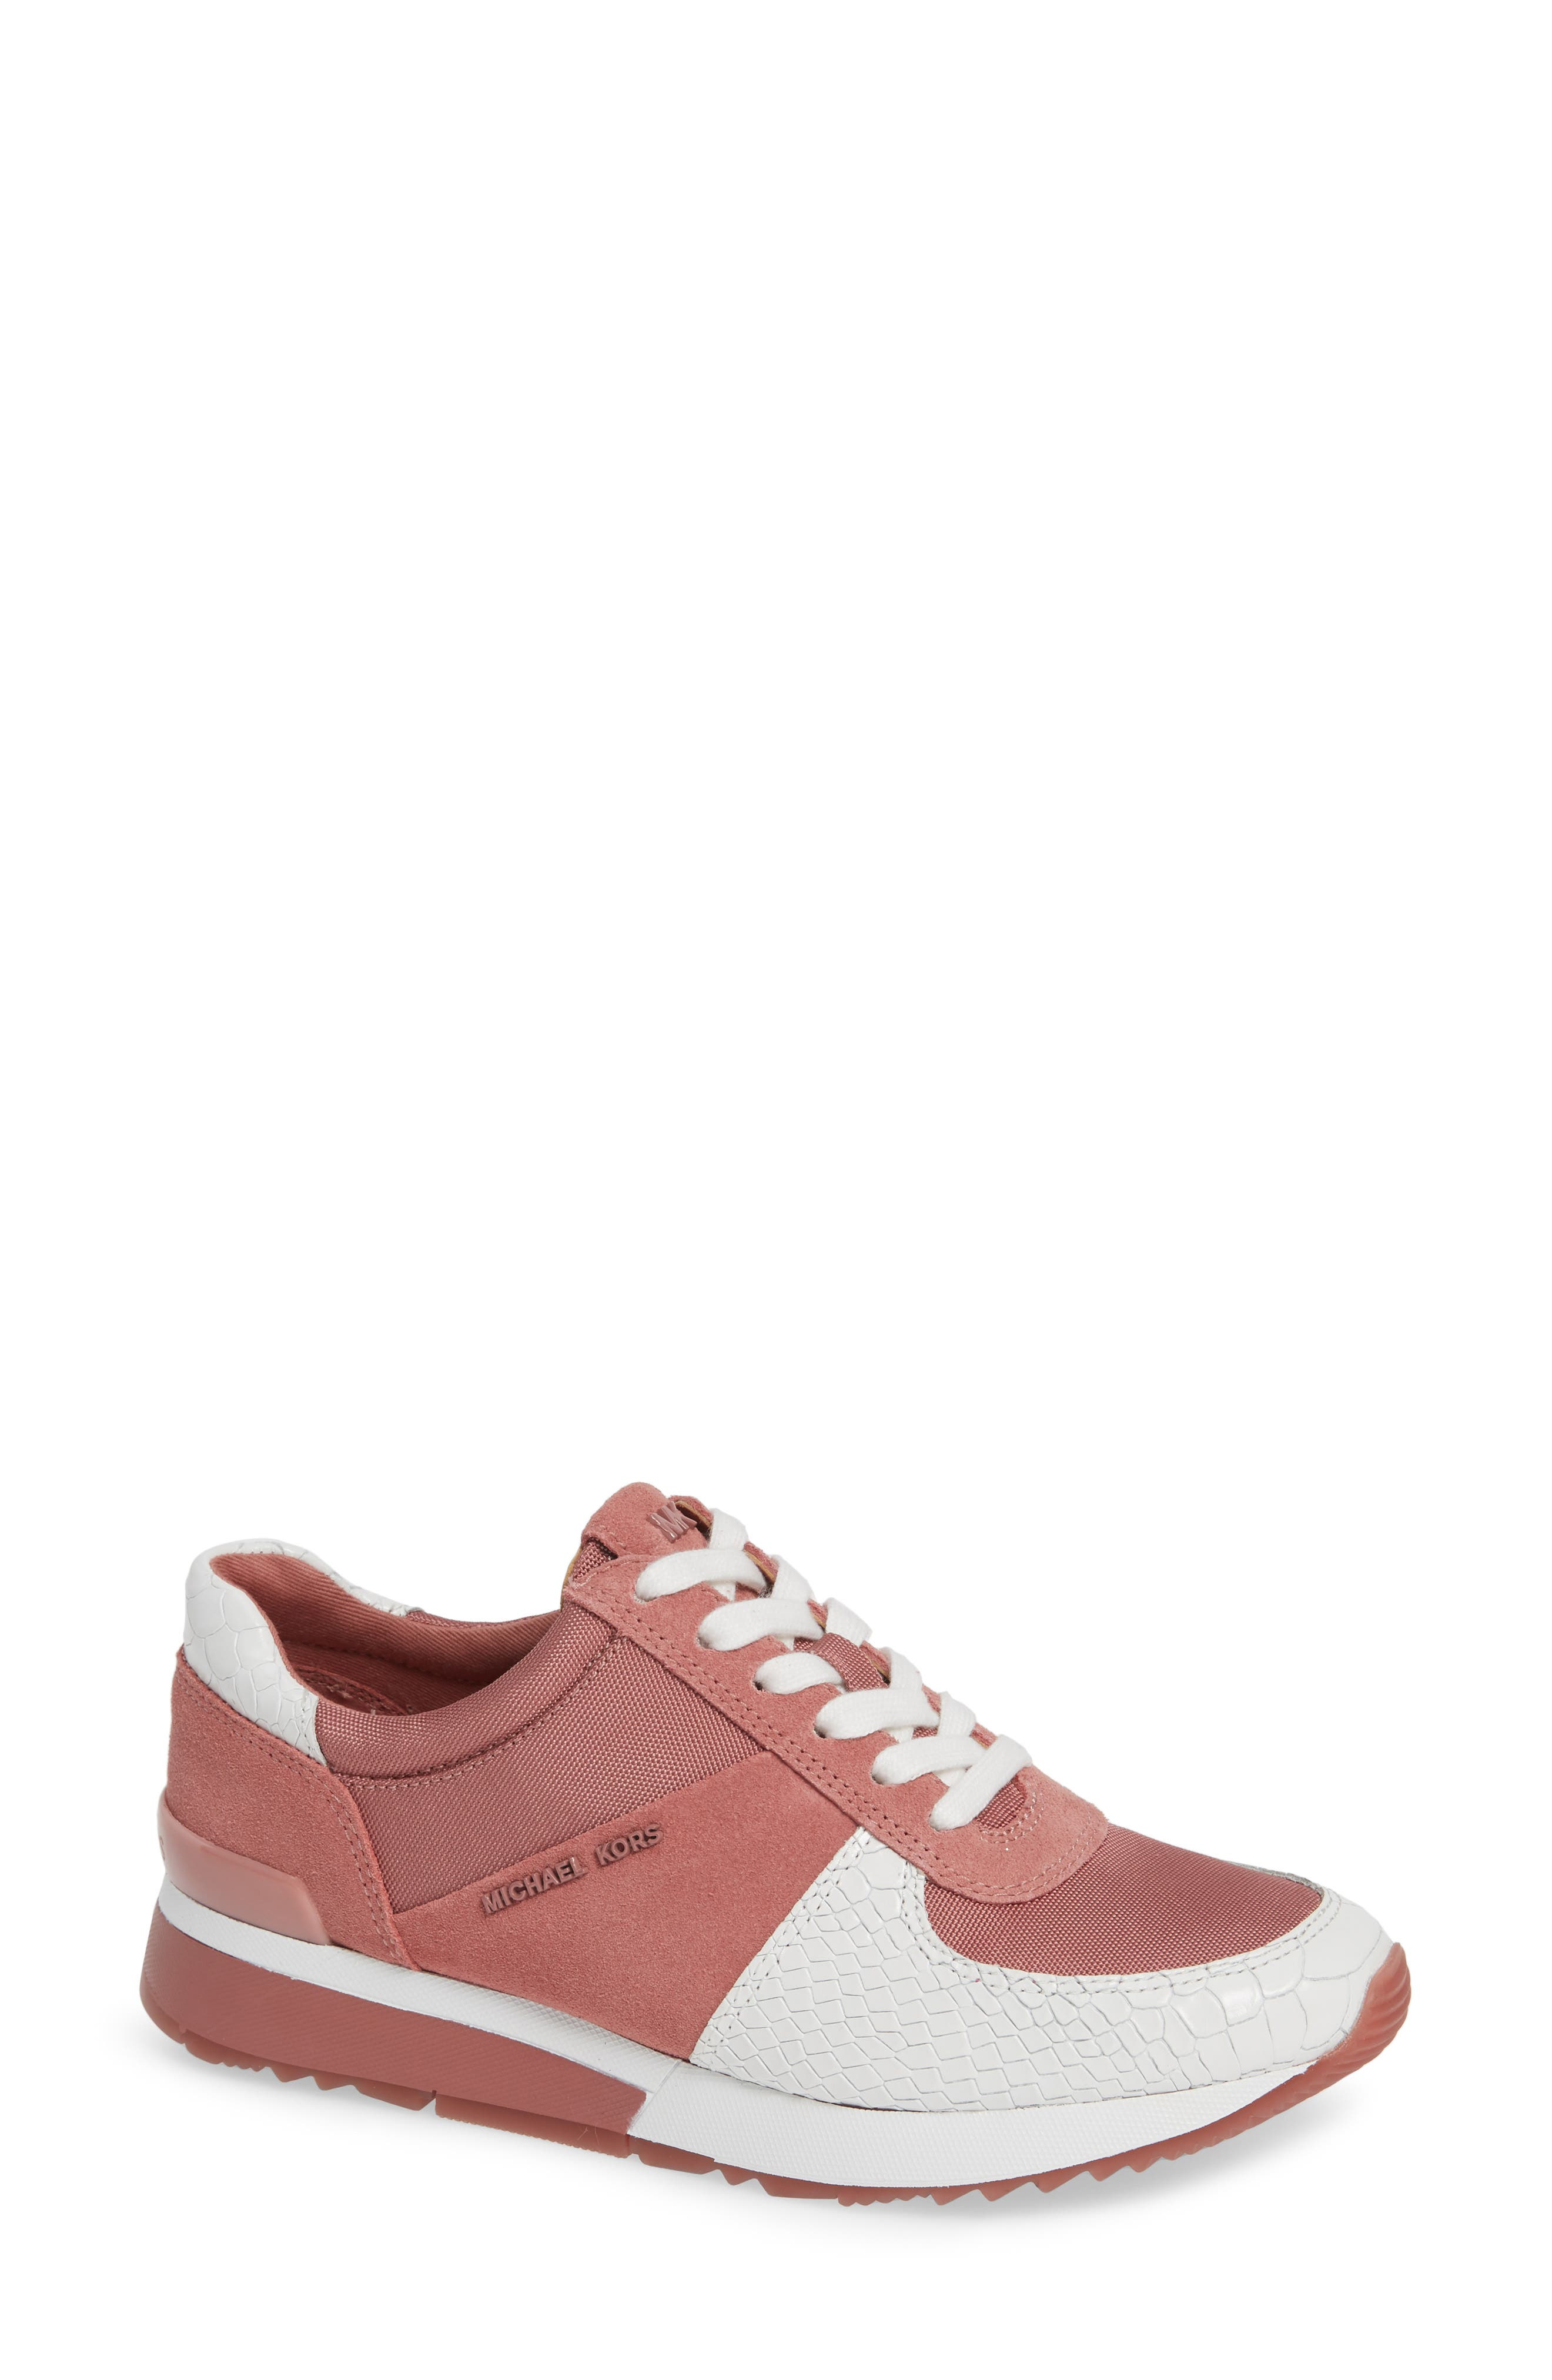 Michael Michael Kors Allie Trainer Sneaker, Pink